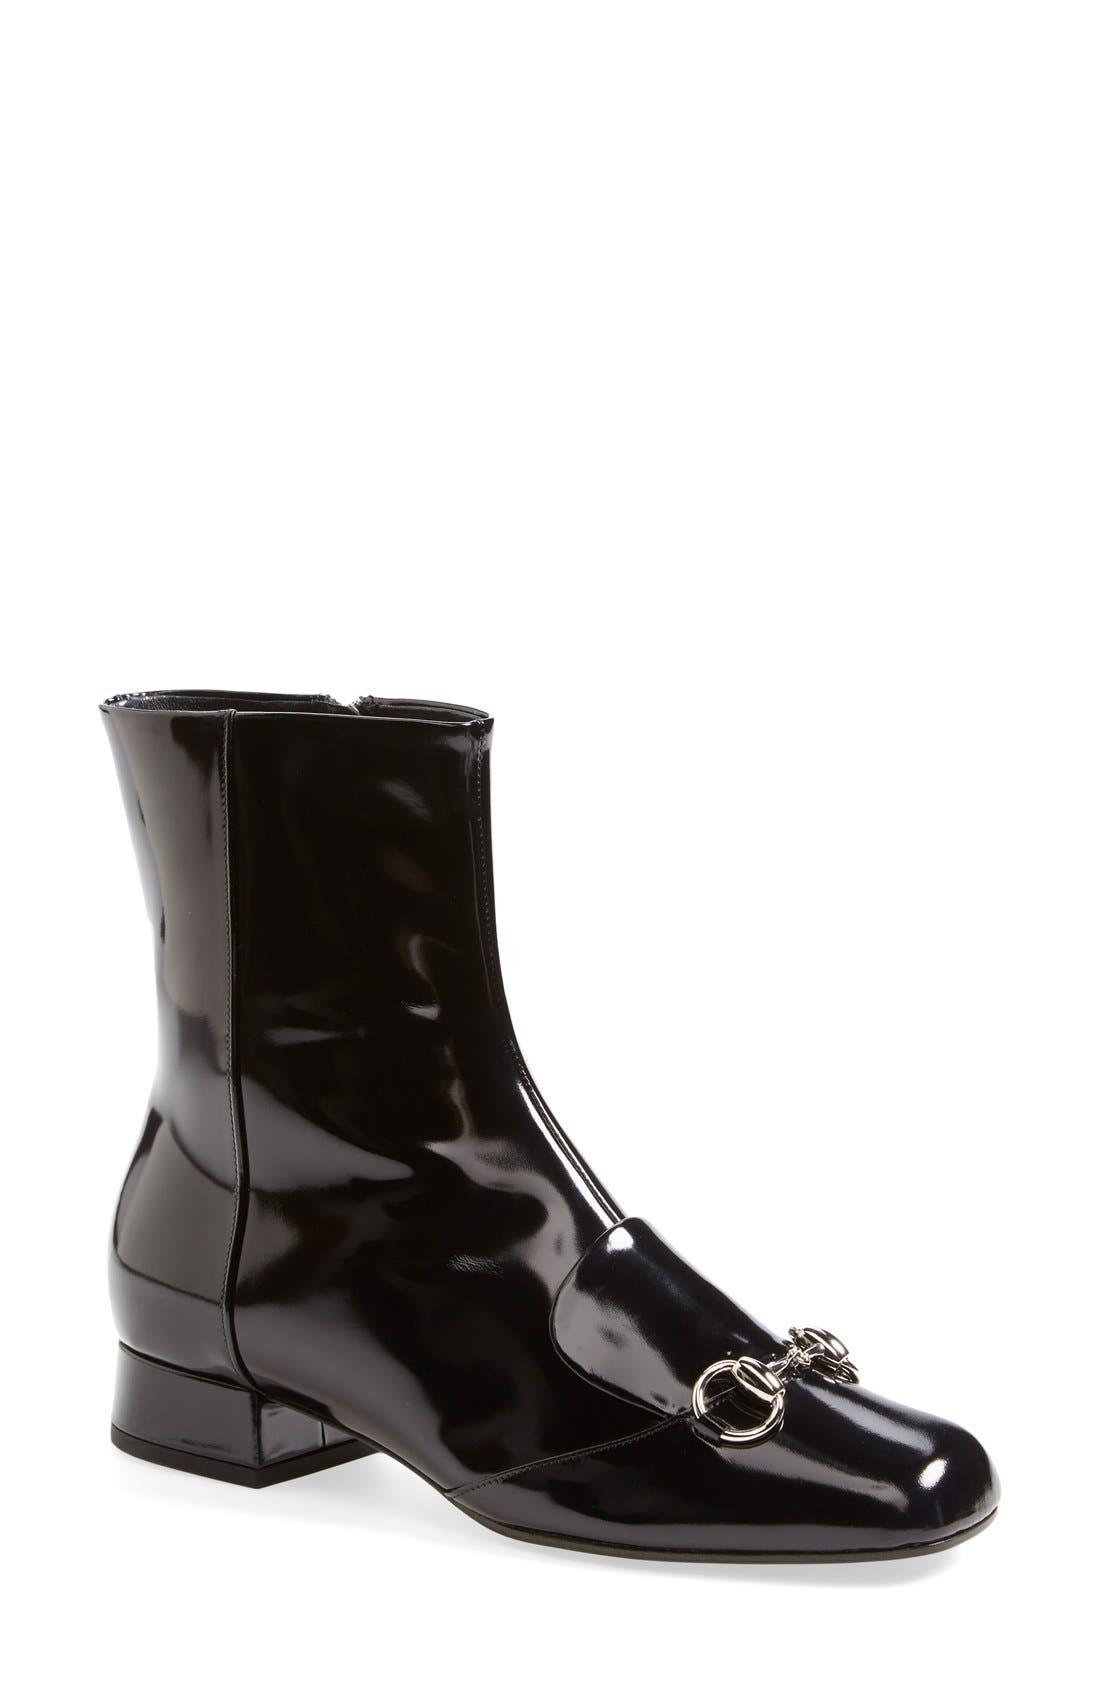 Alternate Image 1 Selected - Gucci 'Lillian' Horsebit Ankle Bootie (Women)